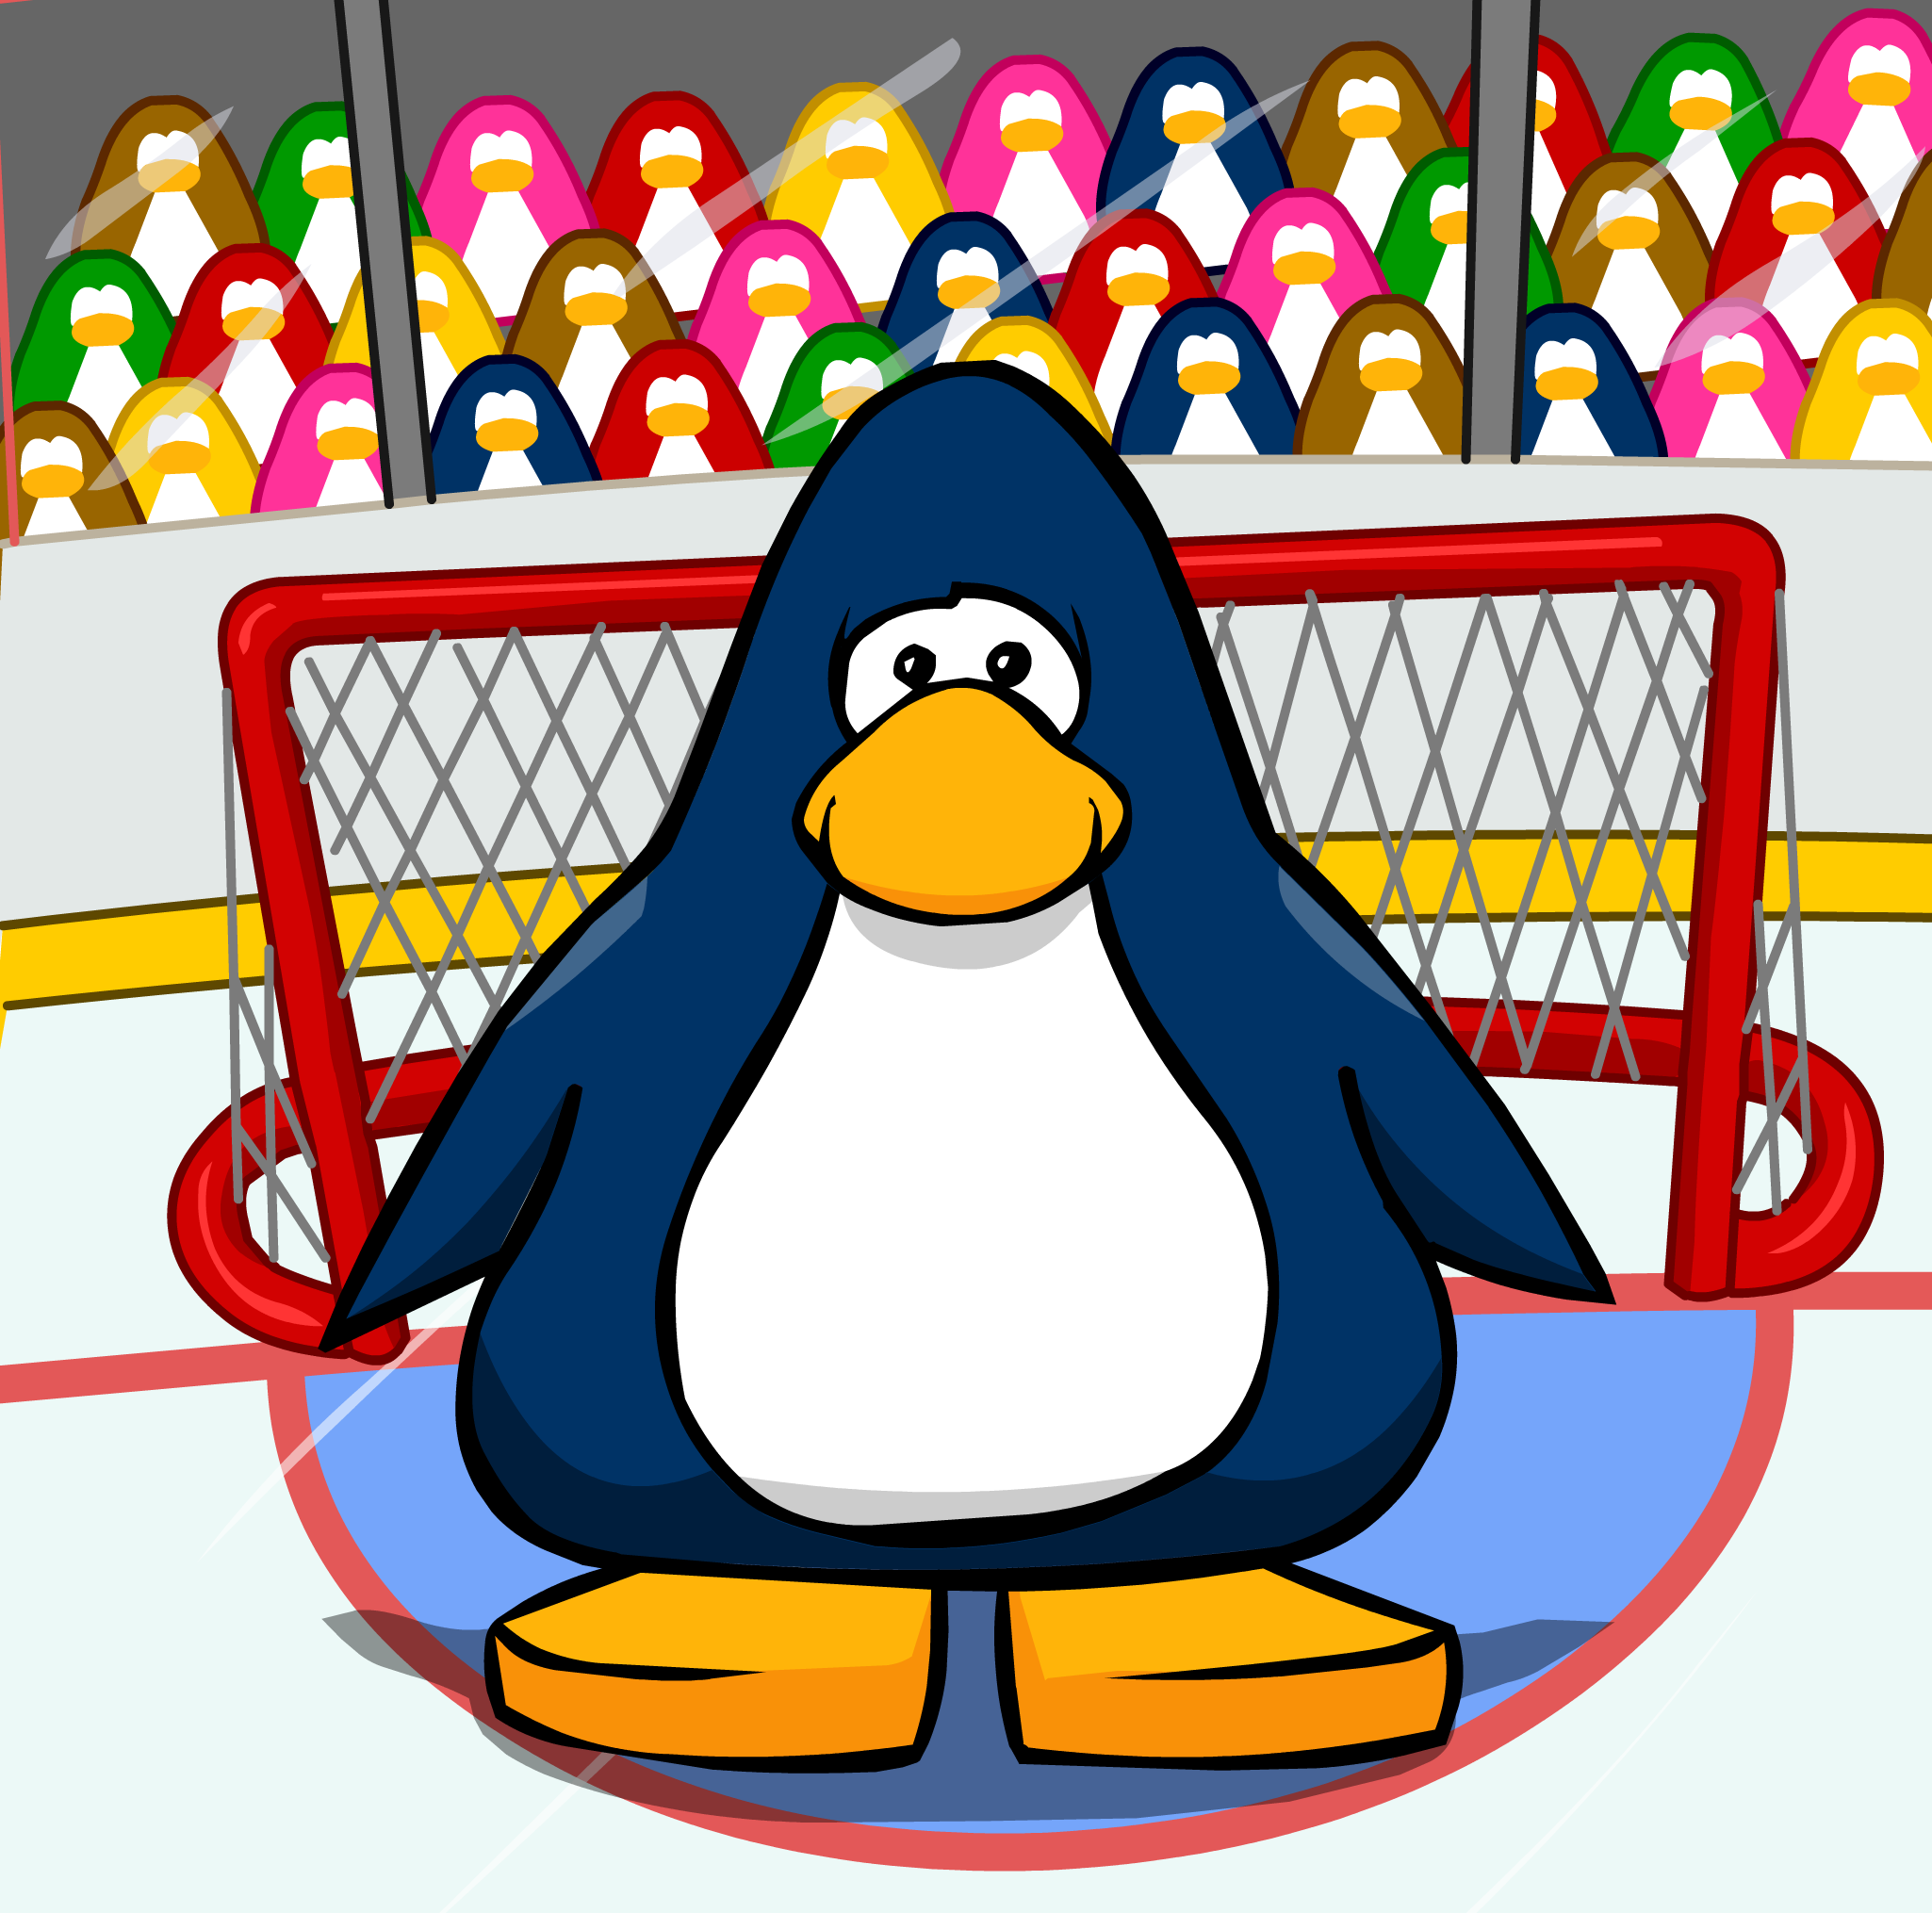 Fondo de Hockey